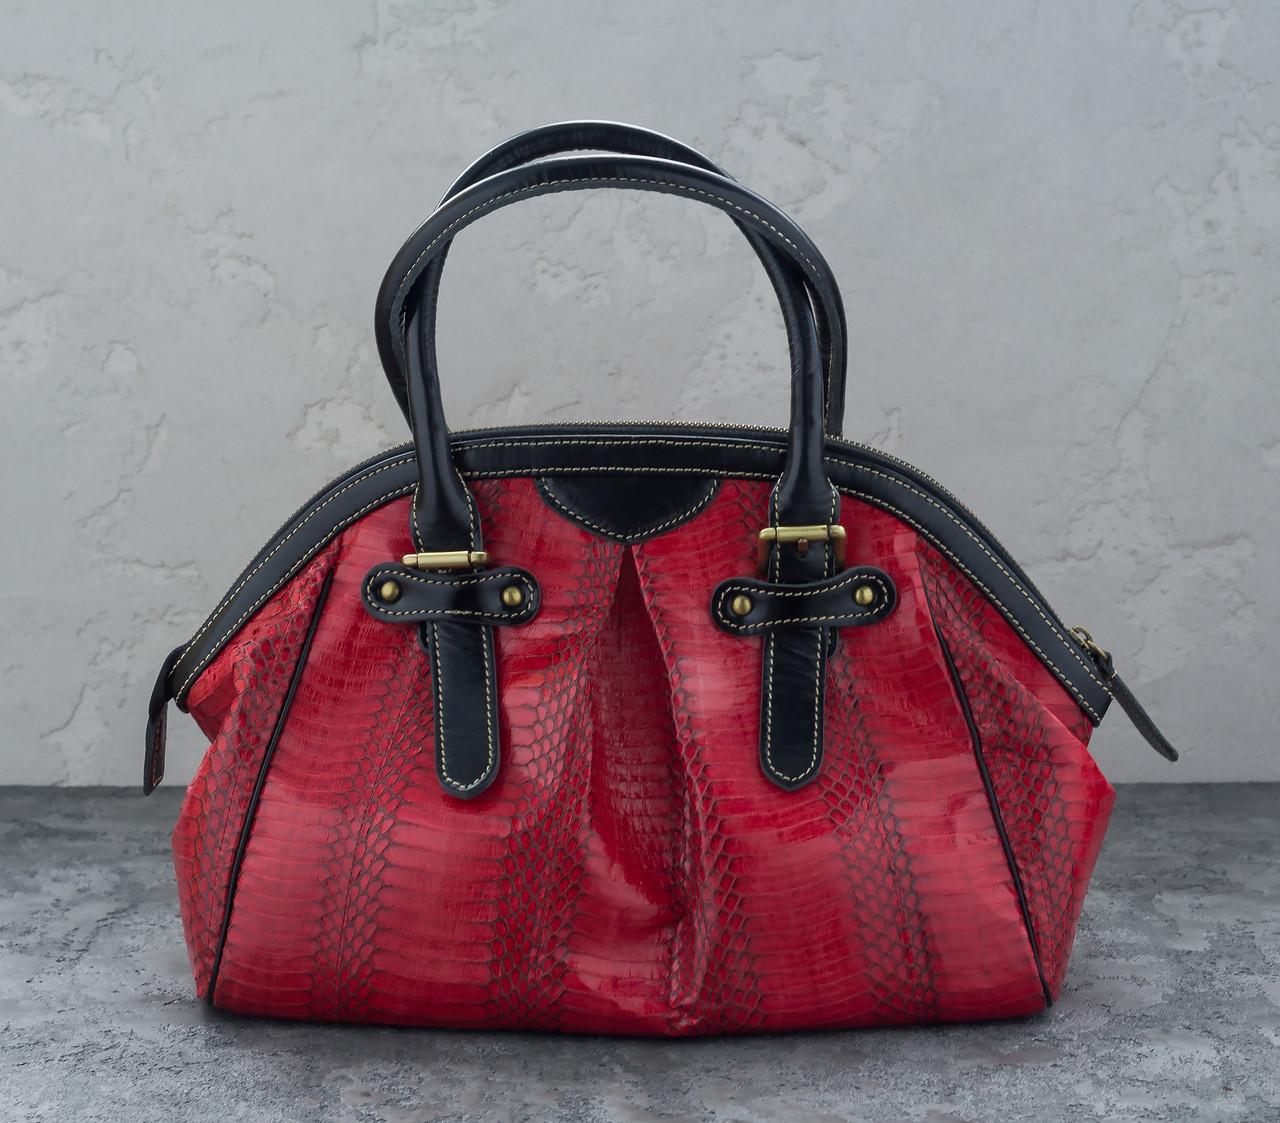 Сумка из кожи кобры  Ekzotic Leather Красная (snc 06)